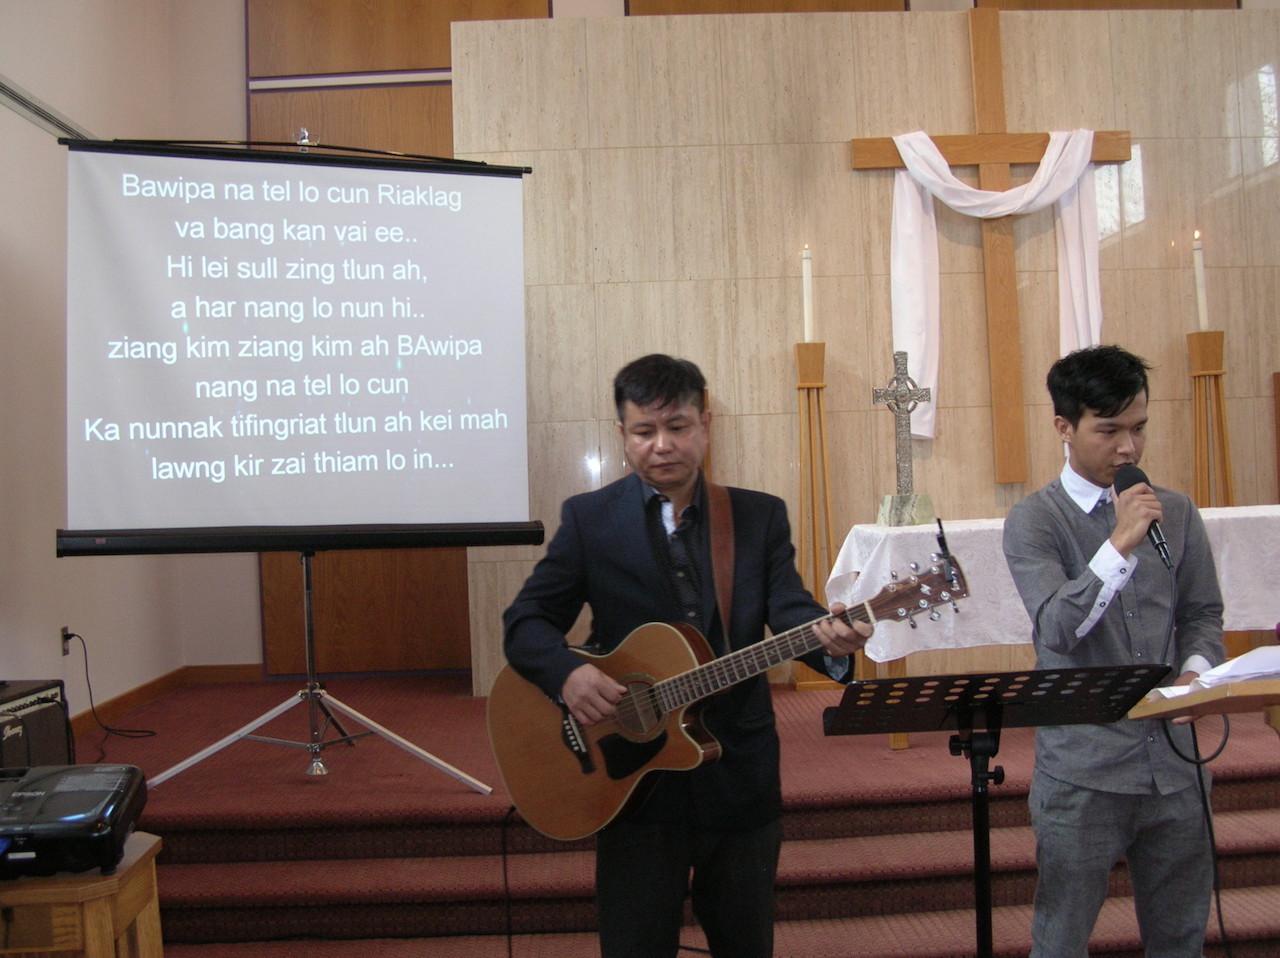 Worshiping through music at the Burmese Church at First Presbyterian Church in Allentown, Pennsylvania.